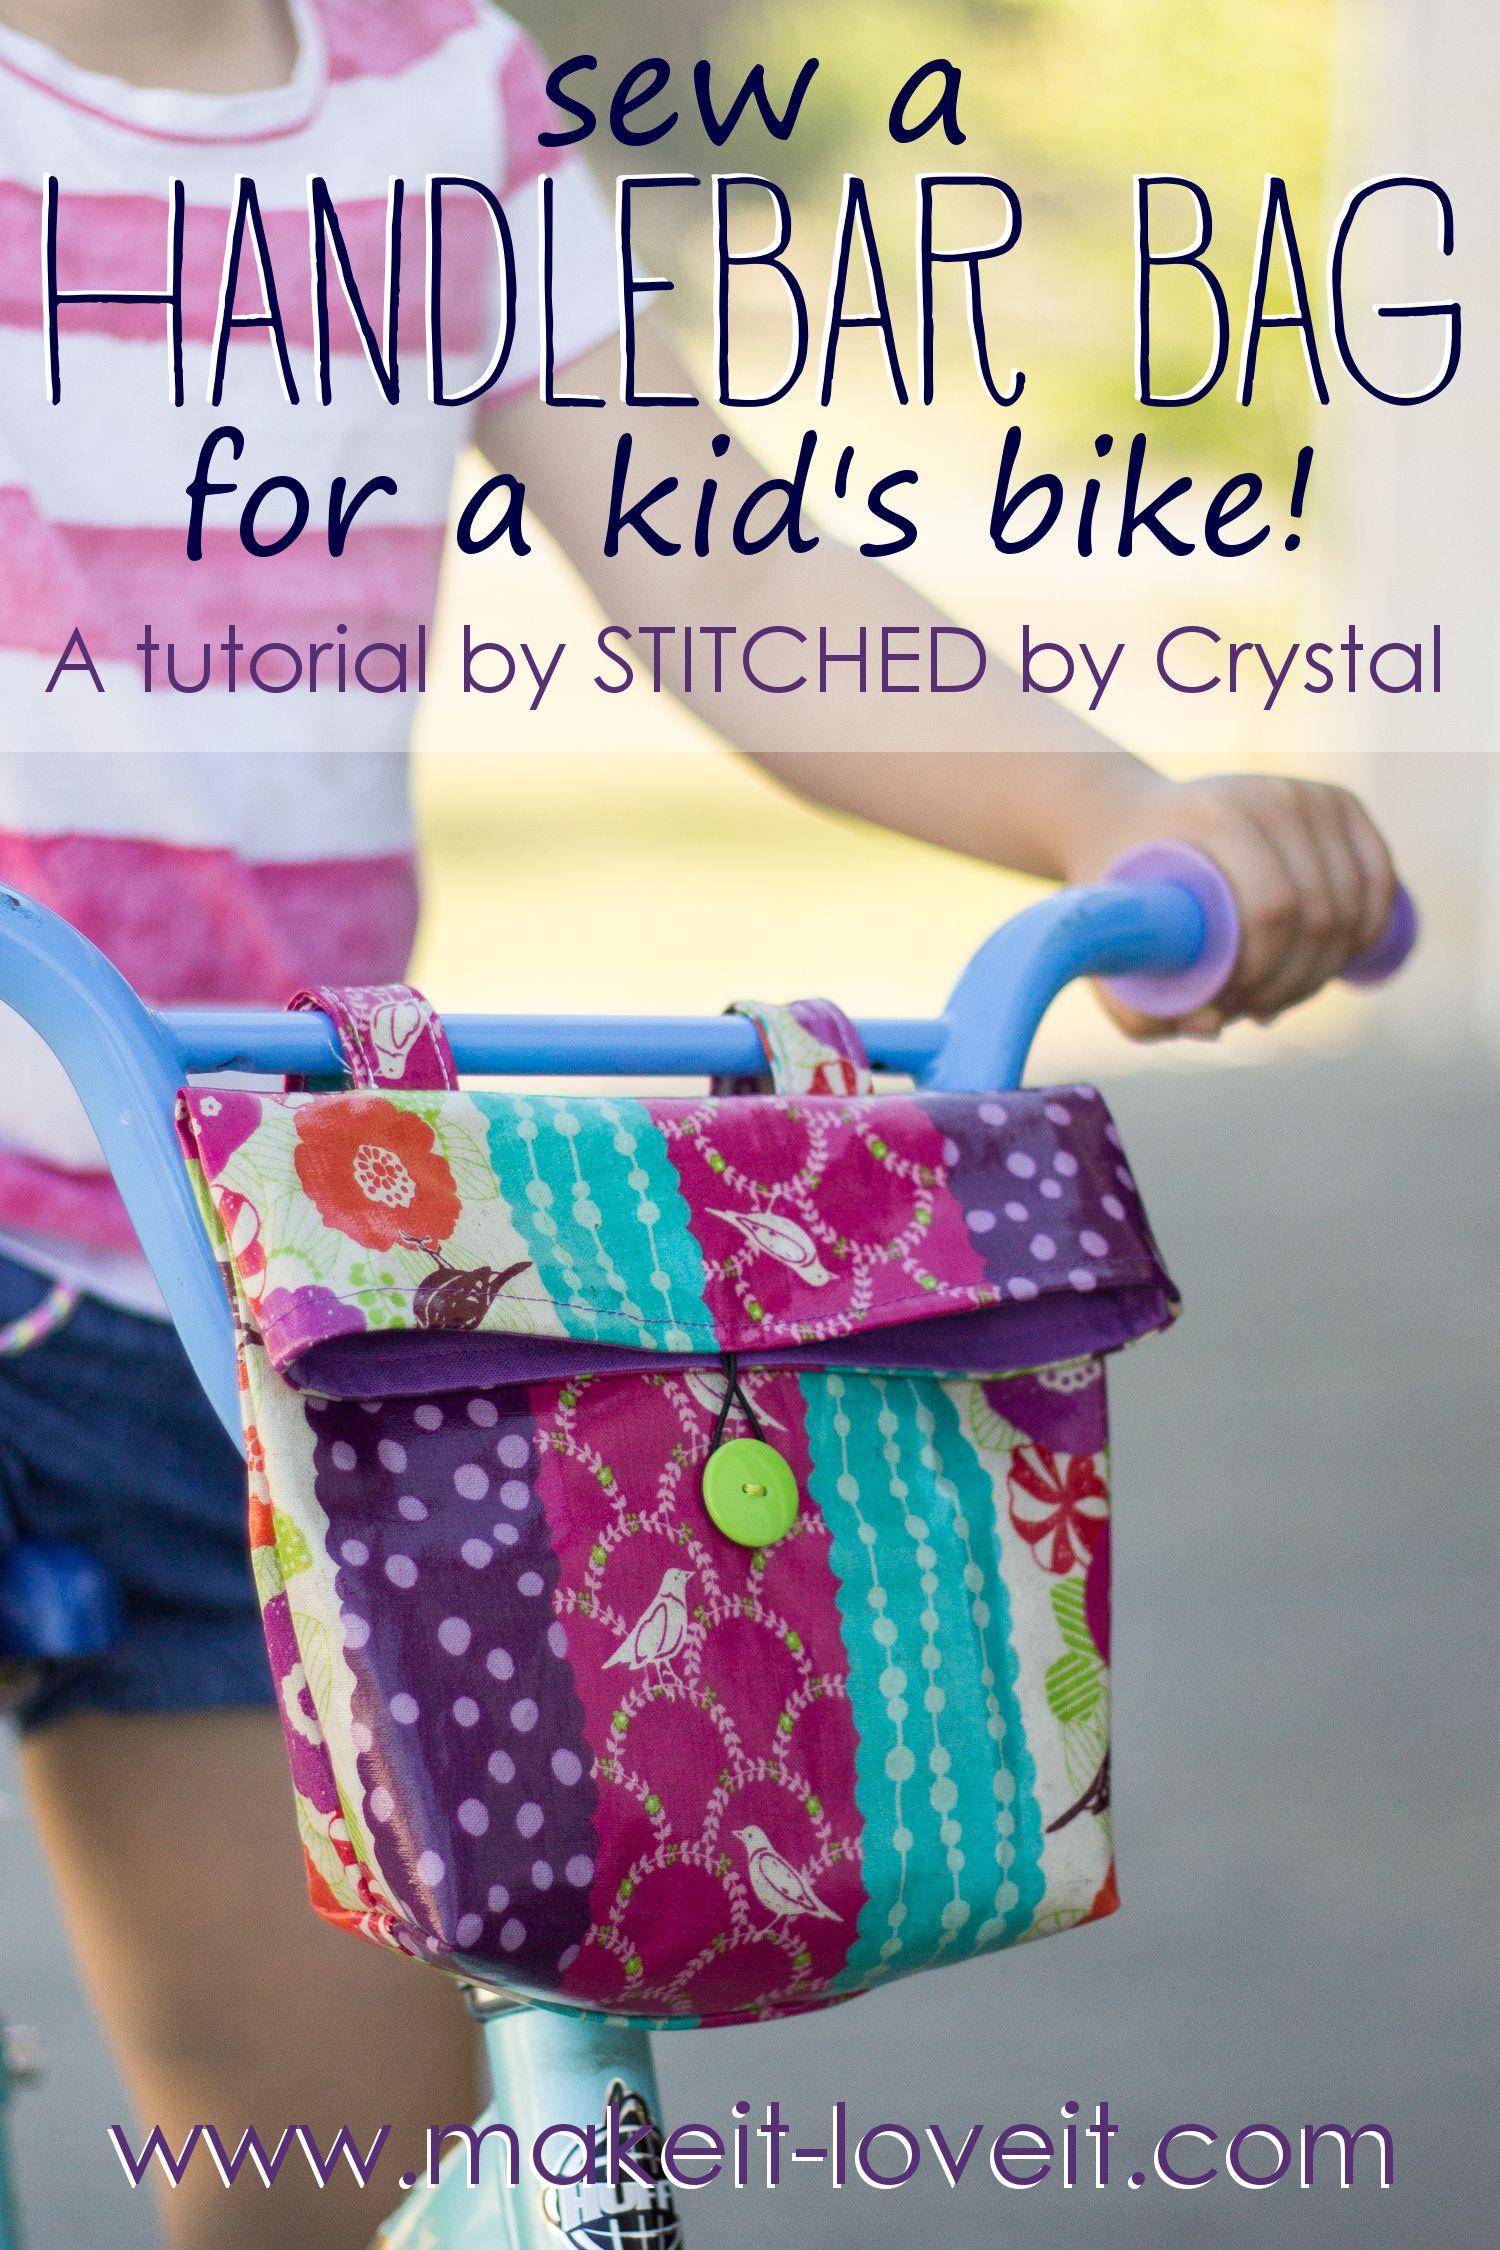 Sew A Handlebar Bag For Your Kid S Bike Sewing Projects For Kids Handlebar Bag Sewing Projects For Beginners